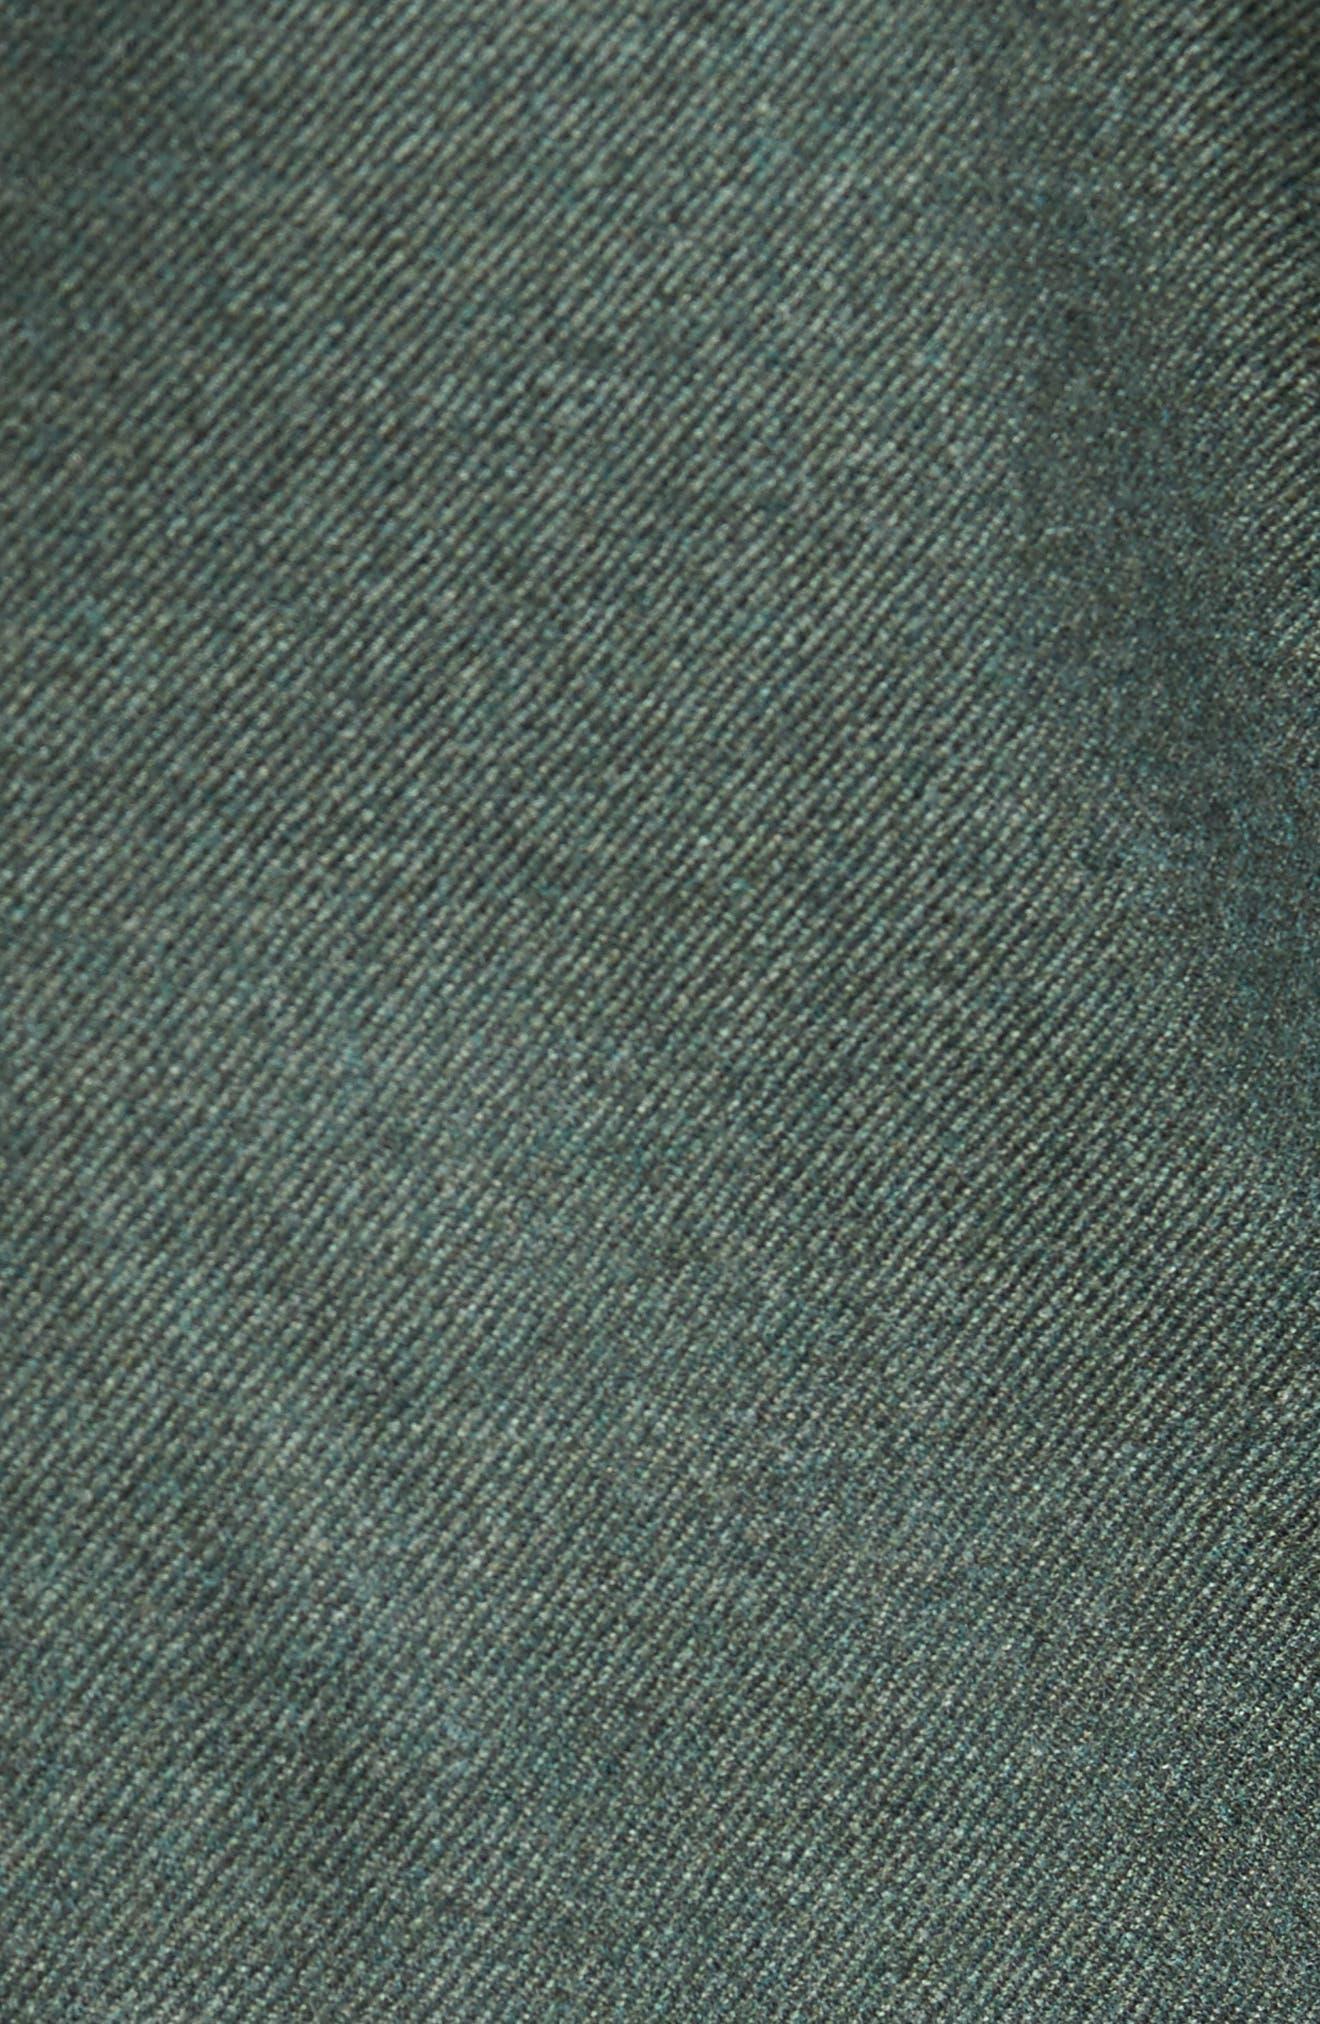 Loro Piana Storm System Shirt Jacket,                             Alternate thumbnail 28, color,